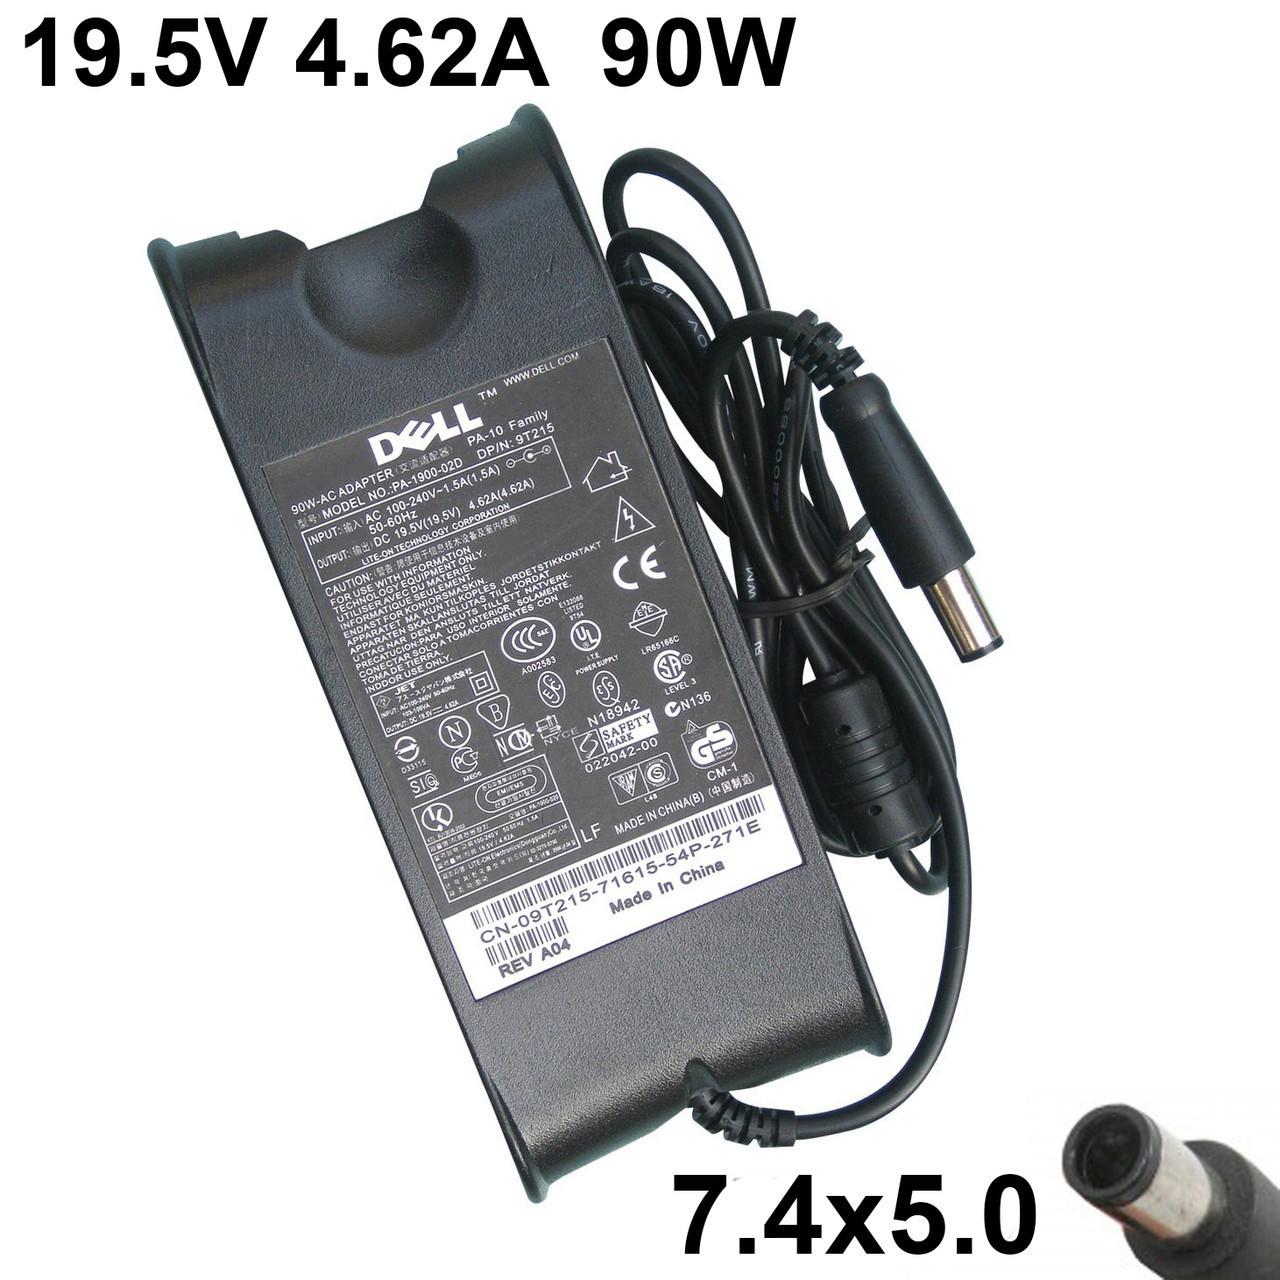 Блок питания для ноутбука зарядное устройство Dell Inspiron 5720, 600, 6000, 600M, 600mcr, 610M, 630, 630M